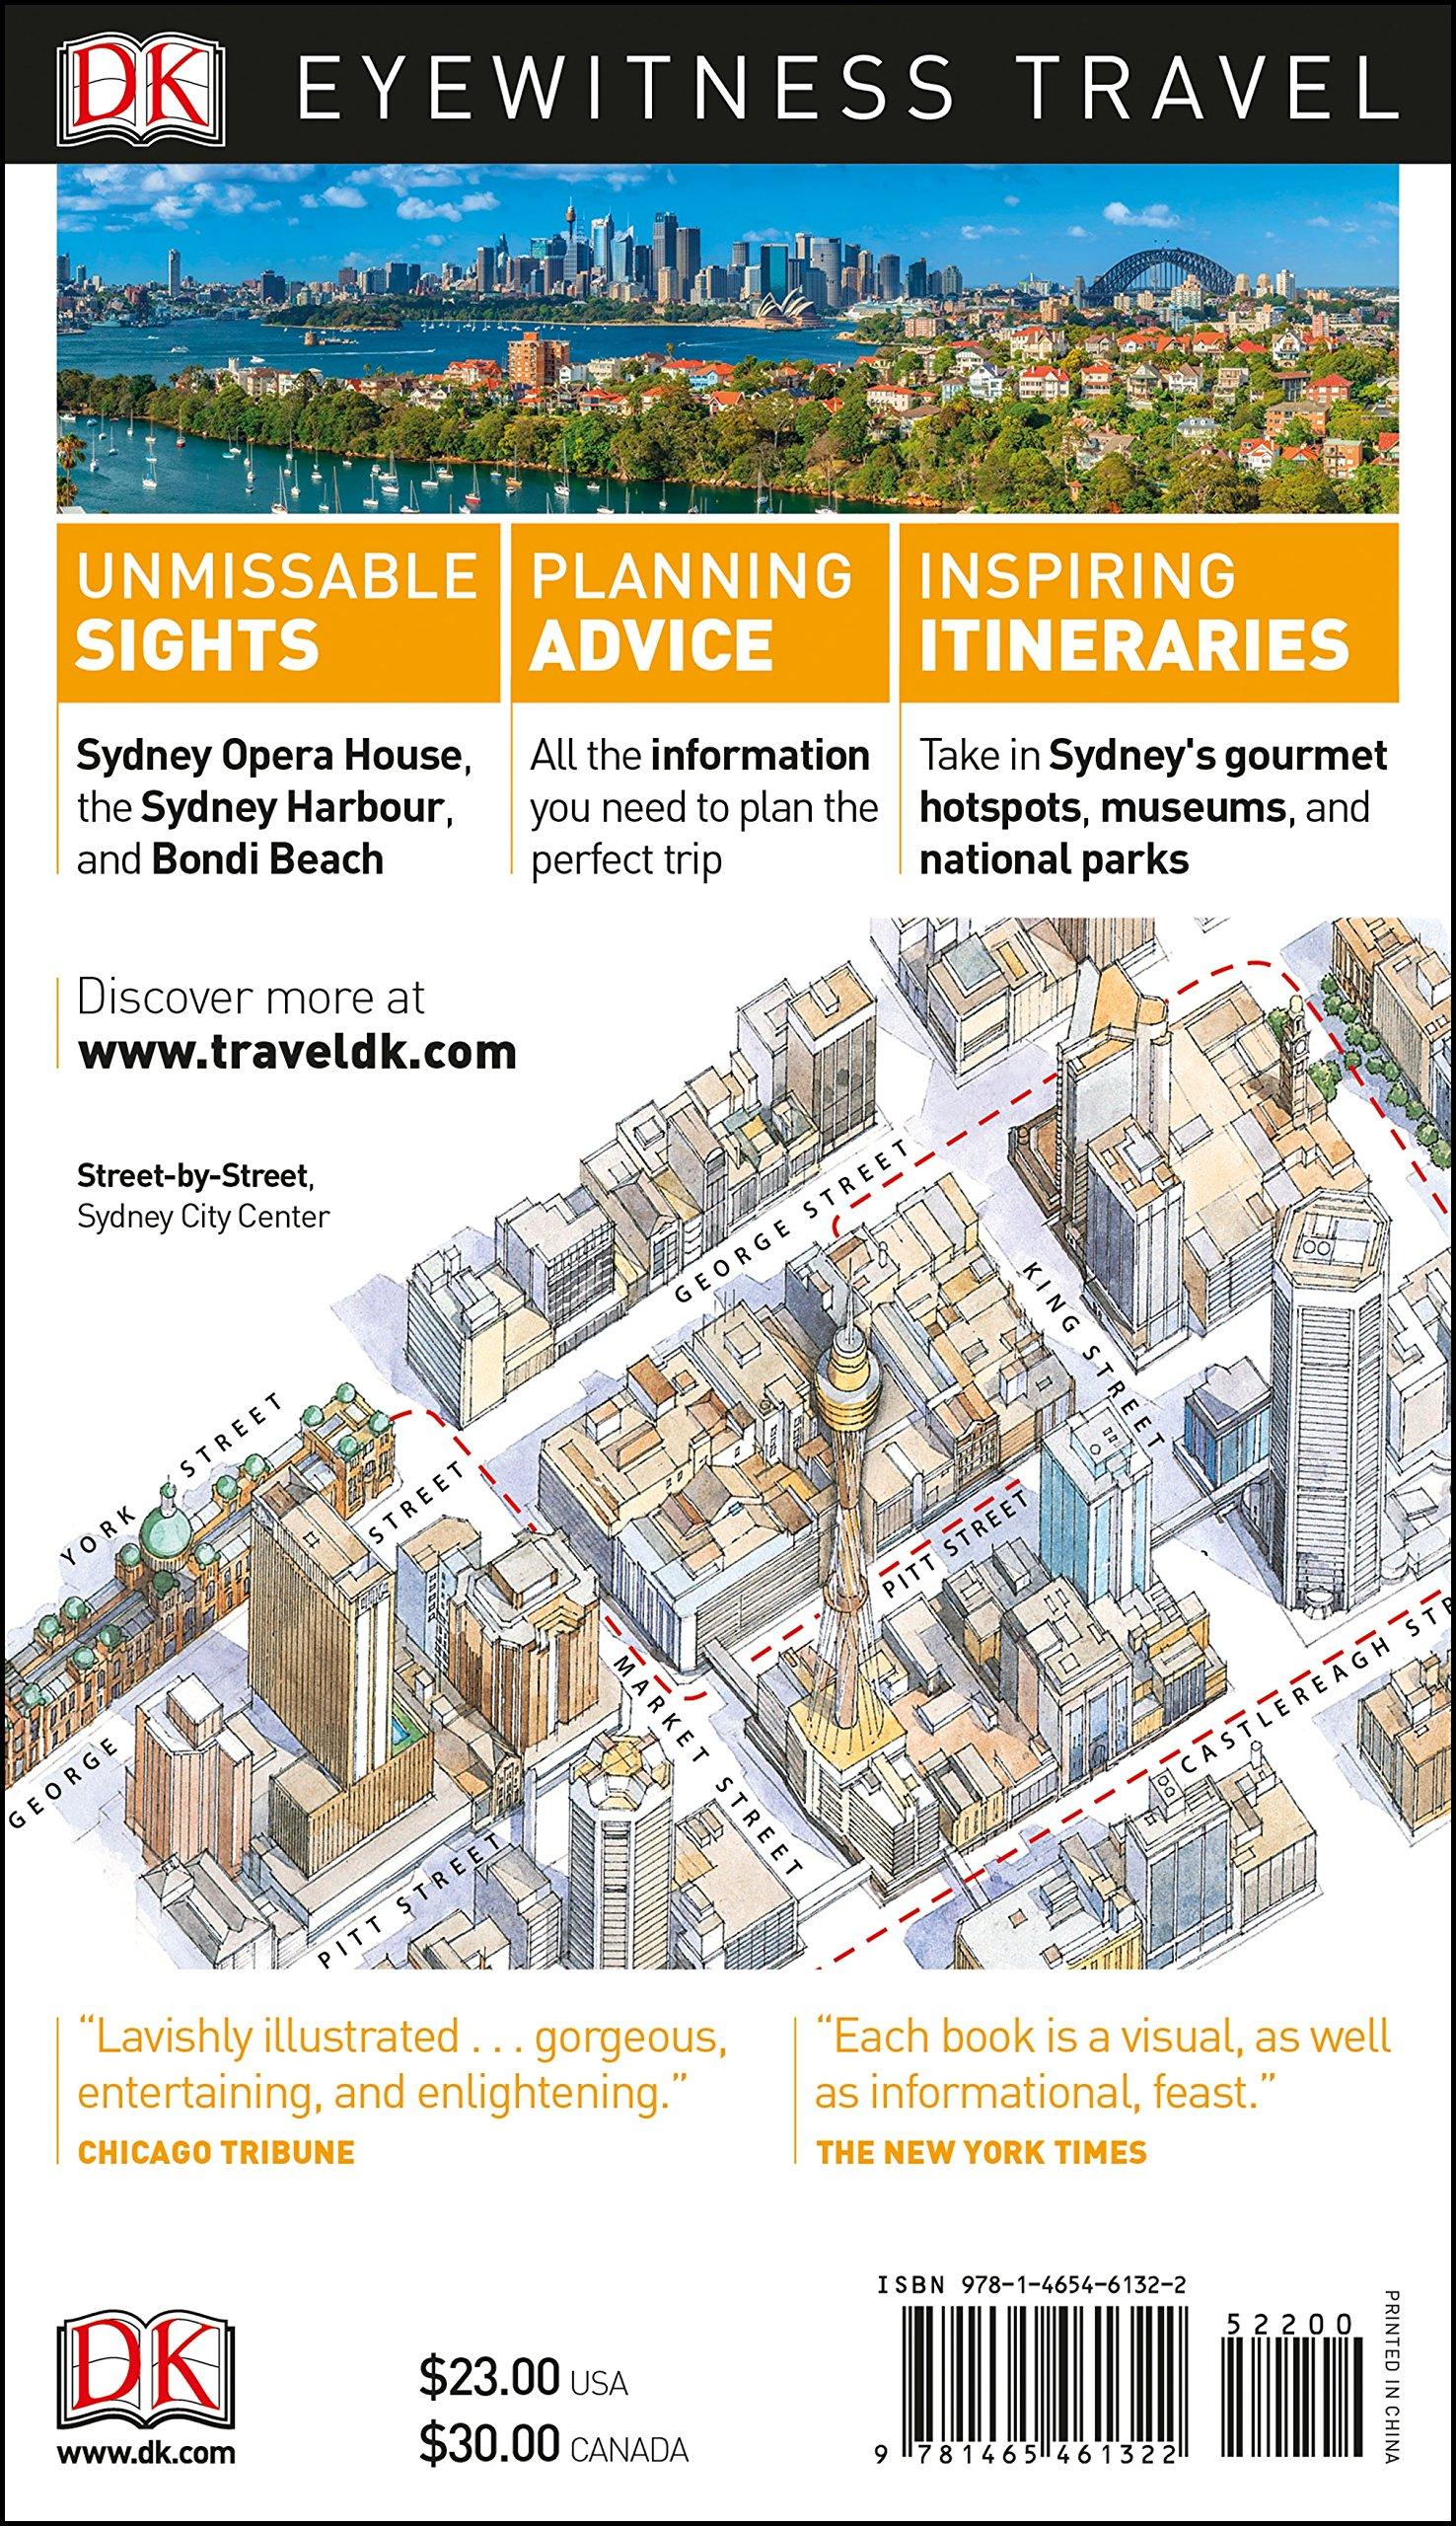 DK Eyewitness Travel Guide Sydney - 91cjJDgafAL - Getting Down Under